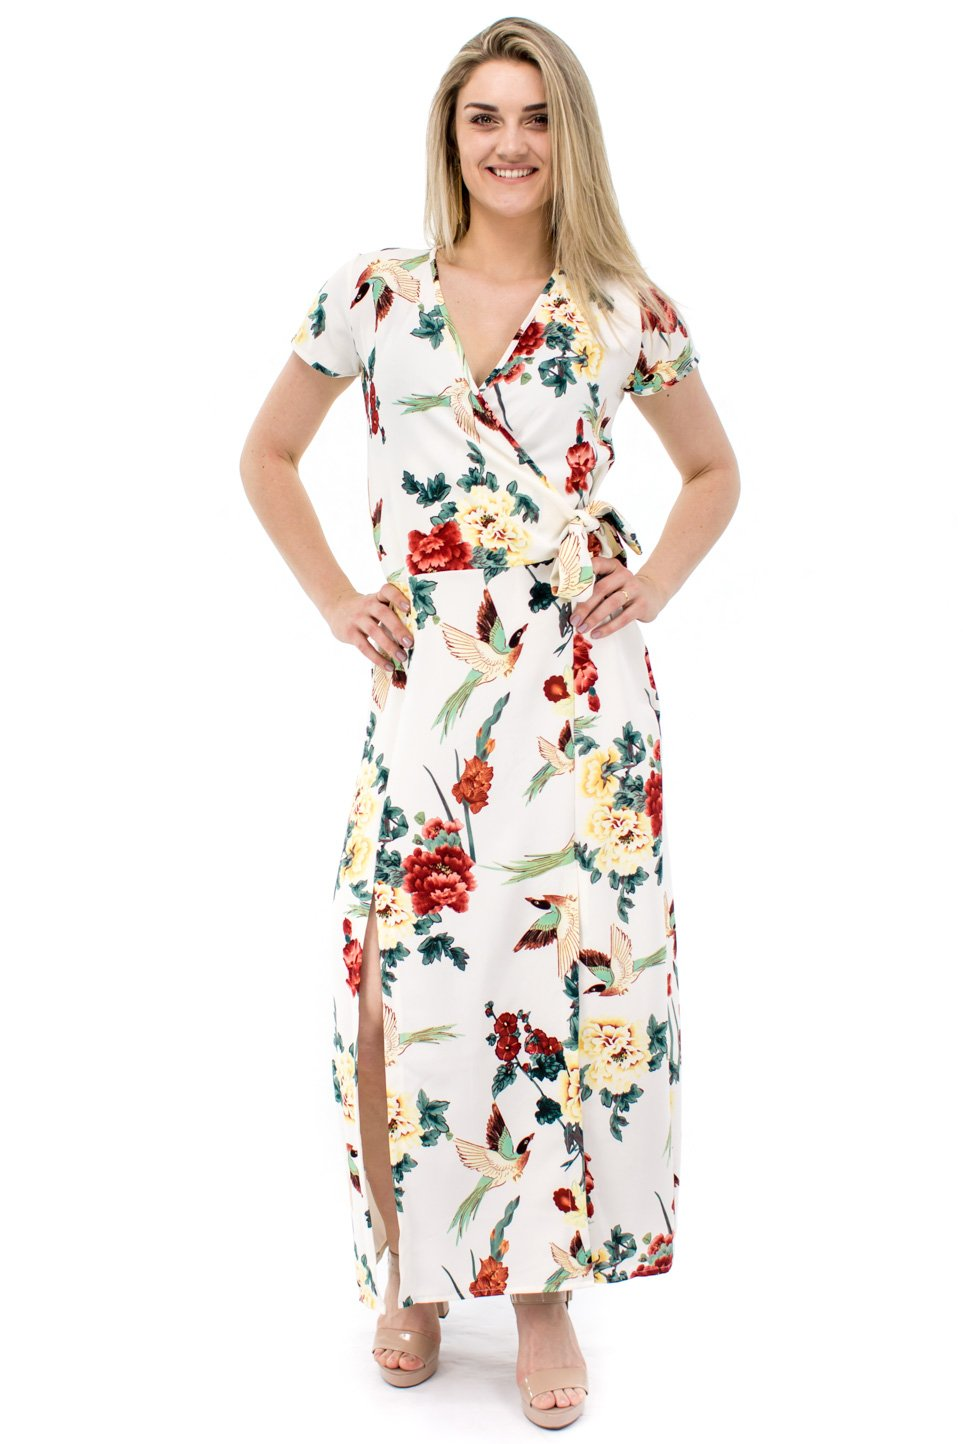 e03849891 Vestido Longo Caterine Manga Curta Estampa Floral Branco - Malharia ...